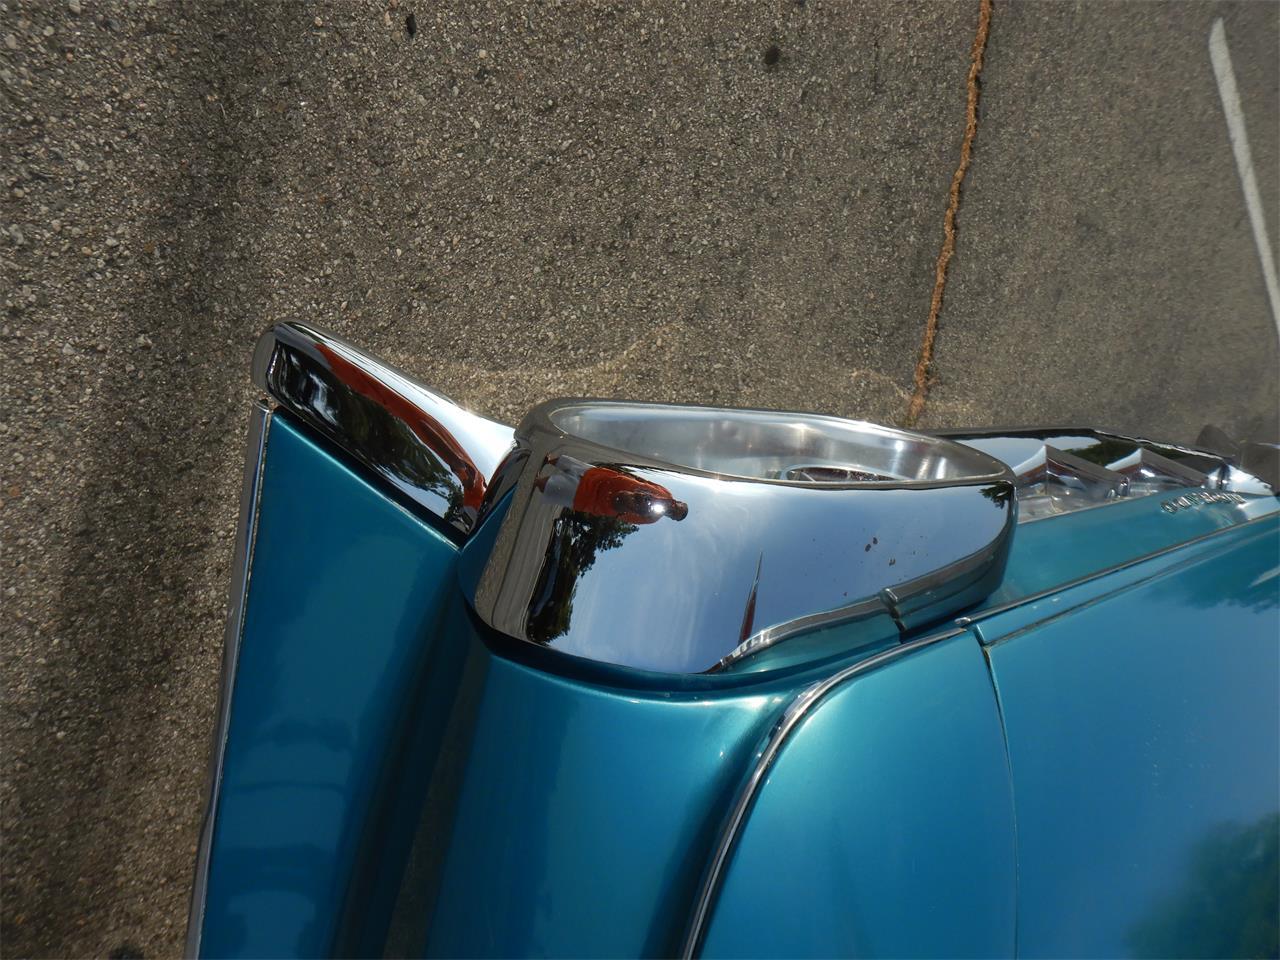 1961 Cadillac Eldorado Biarritz (CC-1412359) for sale in Woodland Hills, California